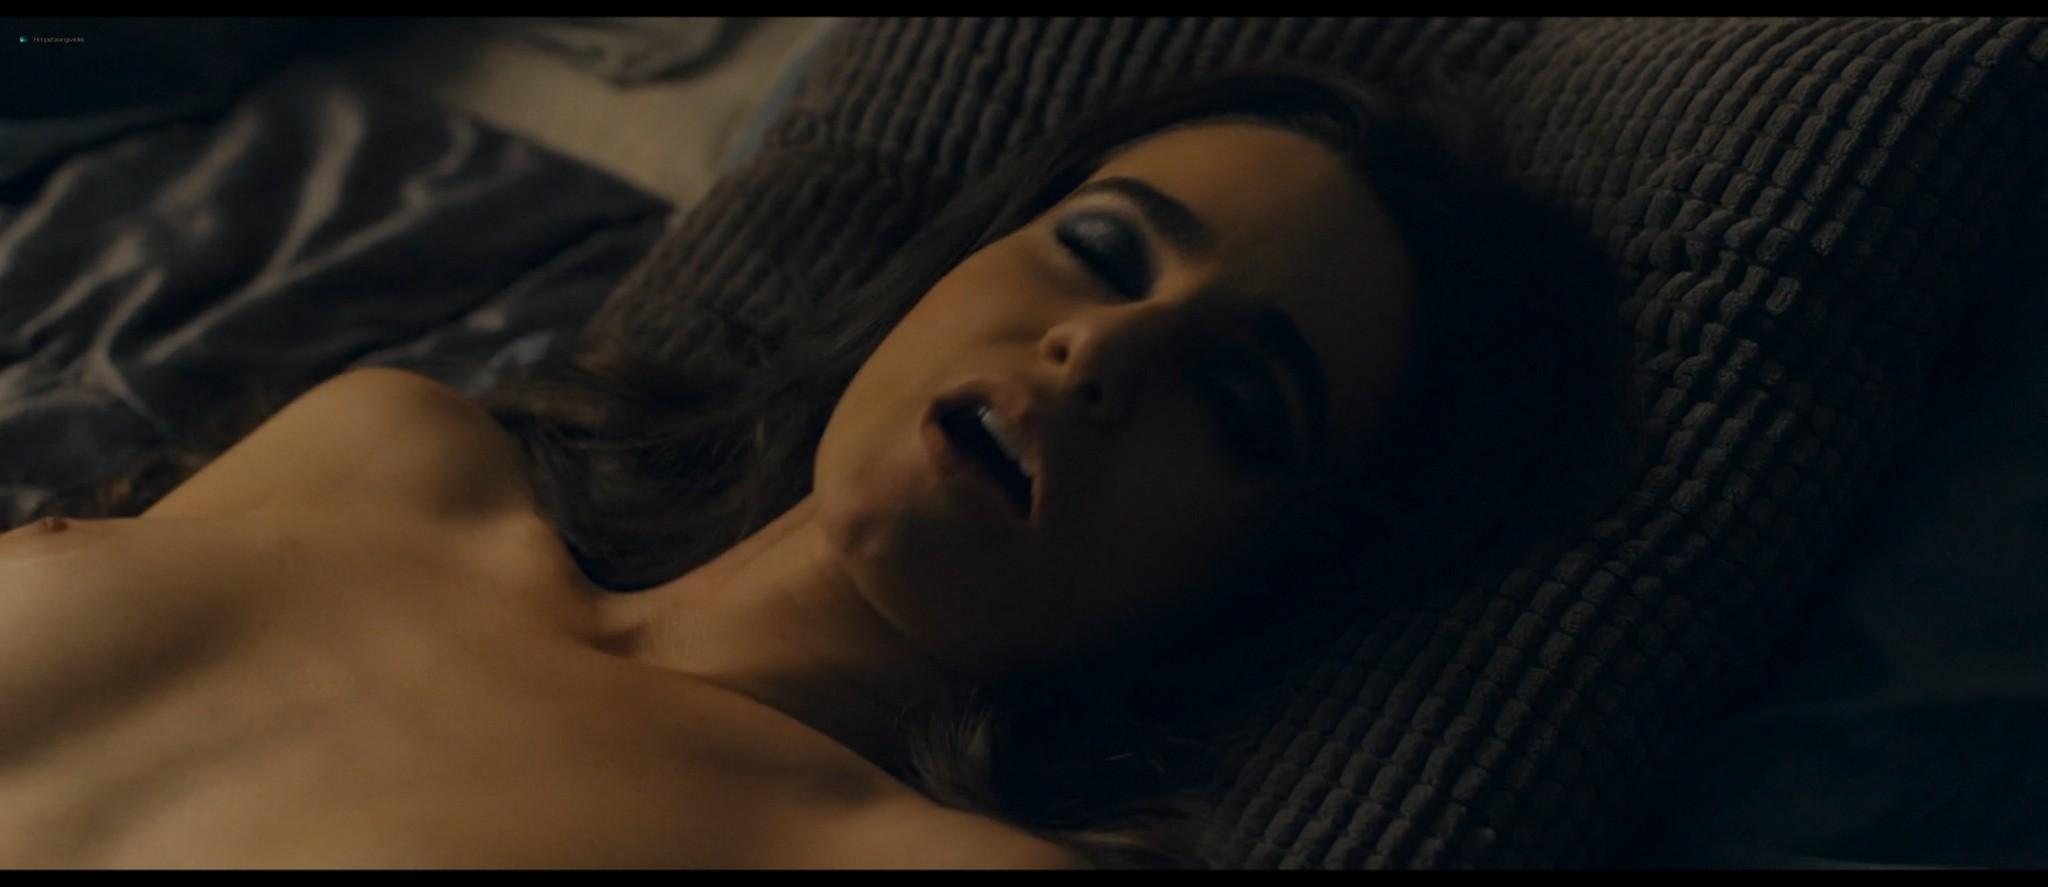 Alicia Sanz nude hot sex - En Brazos de un sesino (2019) HD 1080p Web (3)